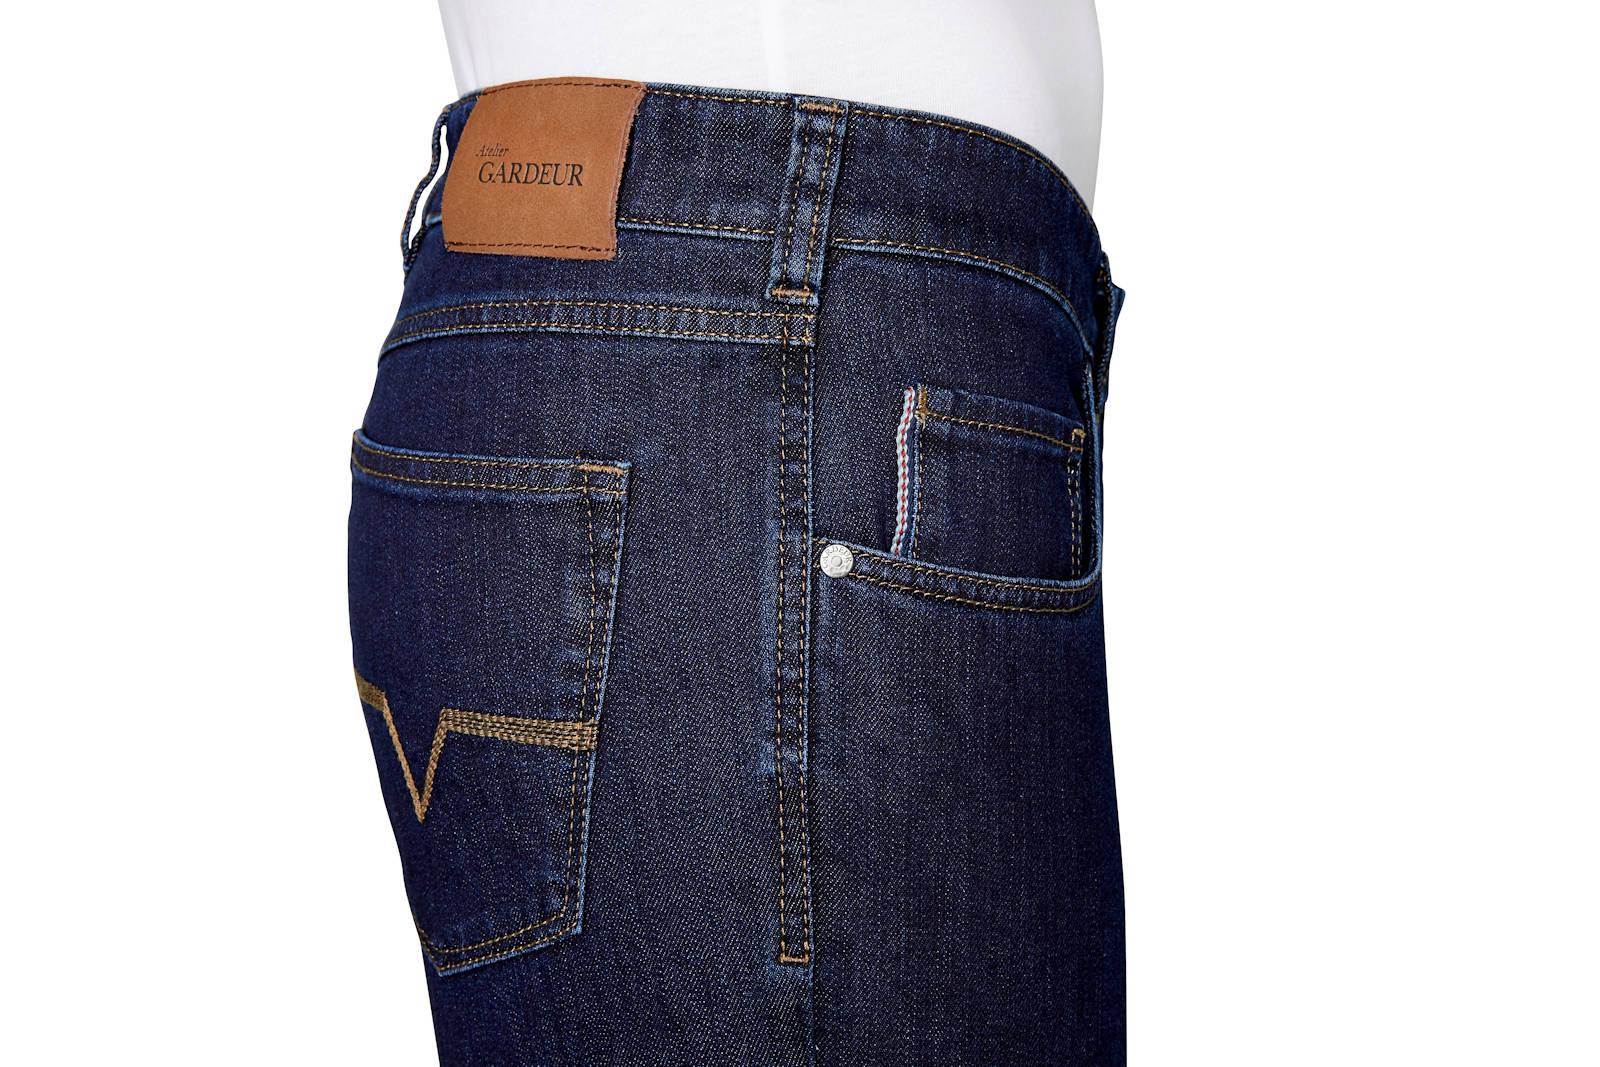 Atelier-GARDEUR-Jeans-NEVIO-11-Regular-Fit-Herren-Hose-Straight-Leg-Denim-NEU Indexbild 13